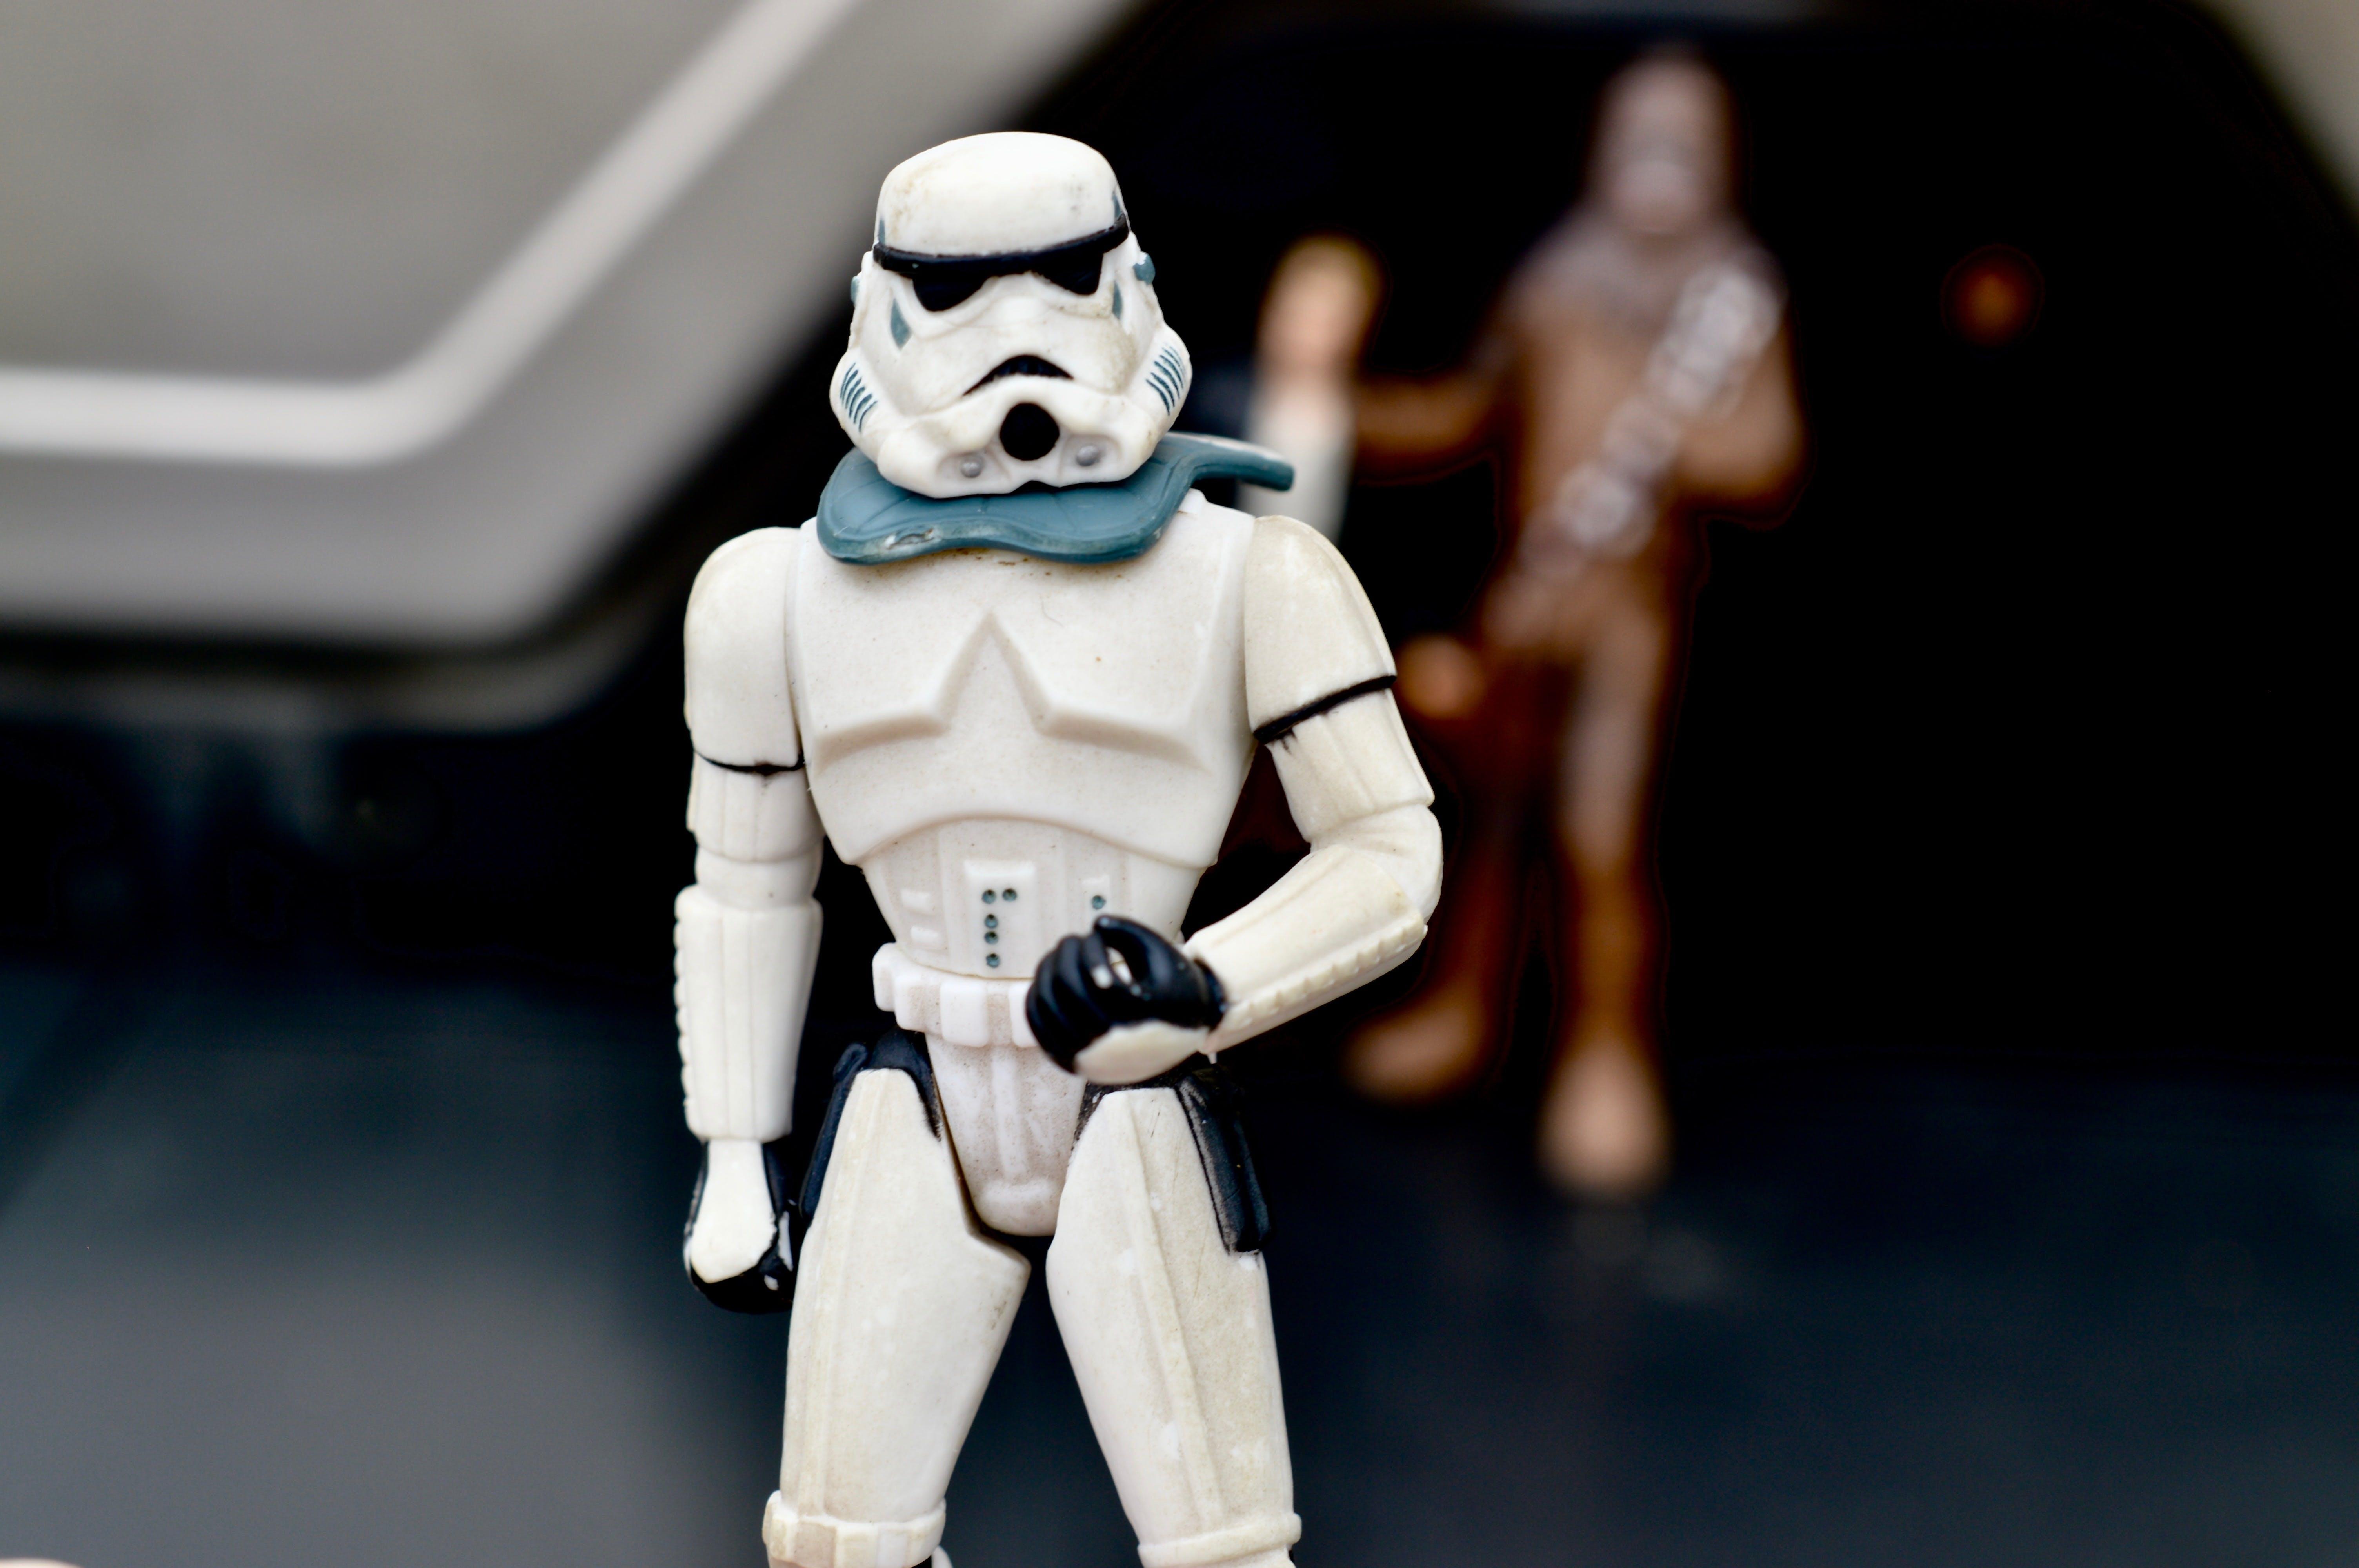 Free stock photo of toy, action figure, film, movie